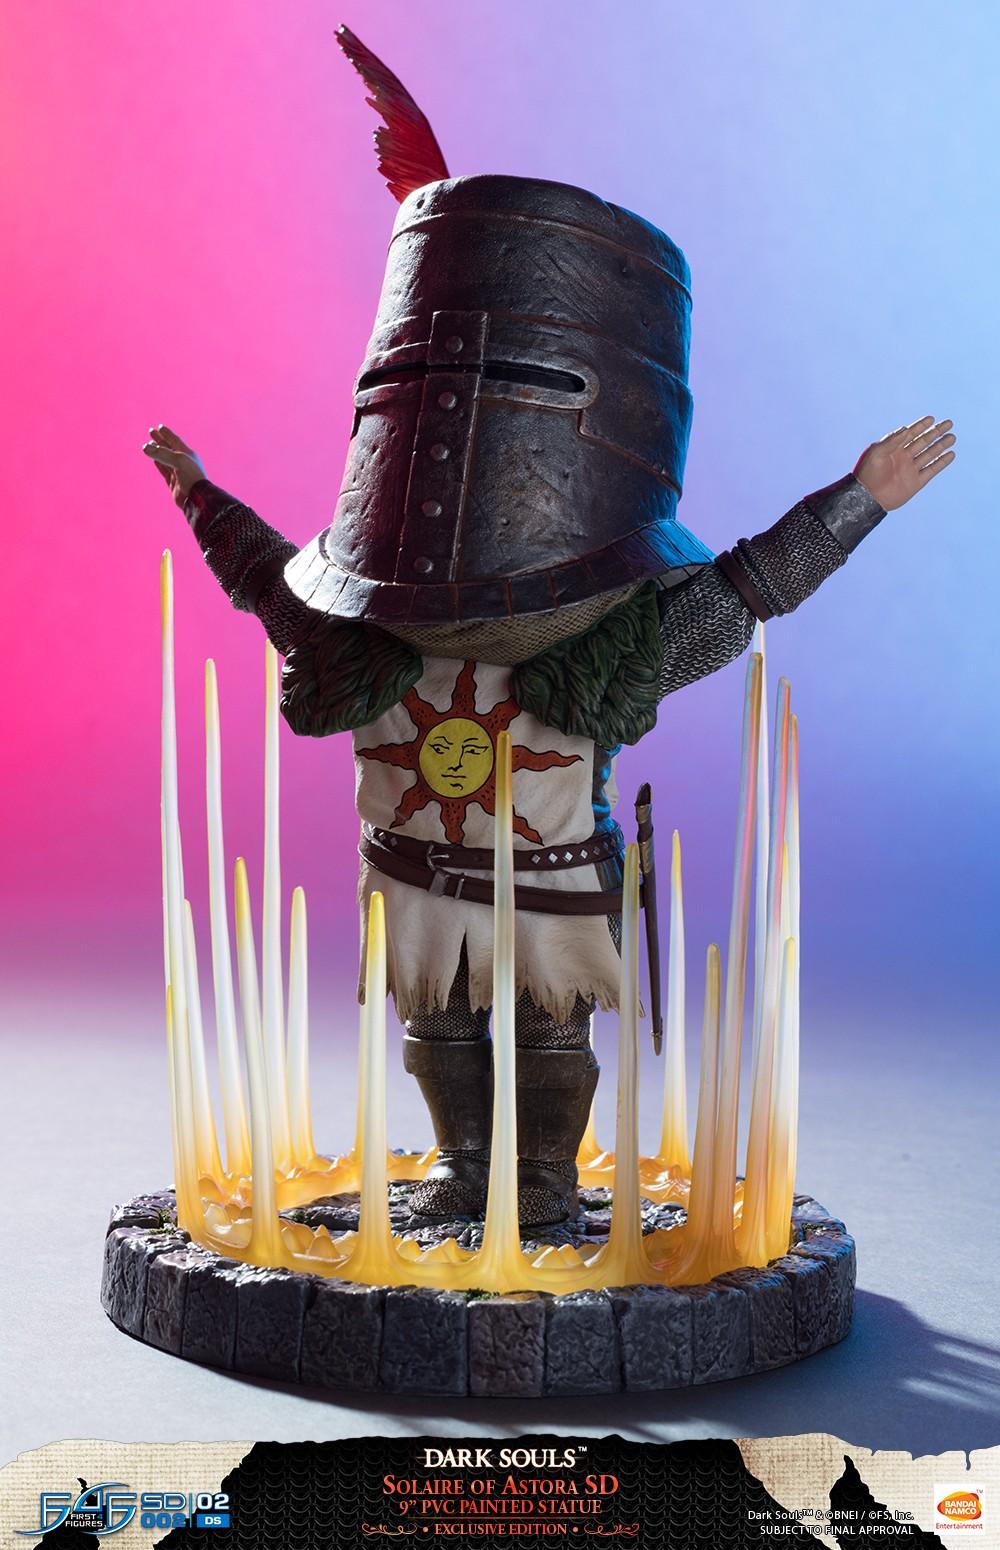 First 4 Figures Dark Souls-Solar De Astora 9 in PVC Statue peinte environ 22.86 cm